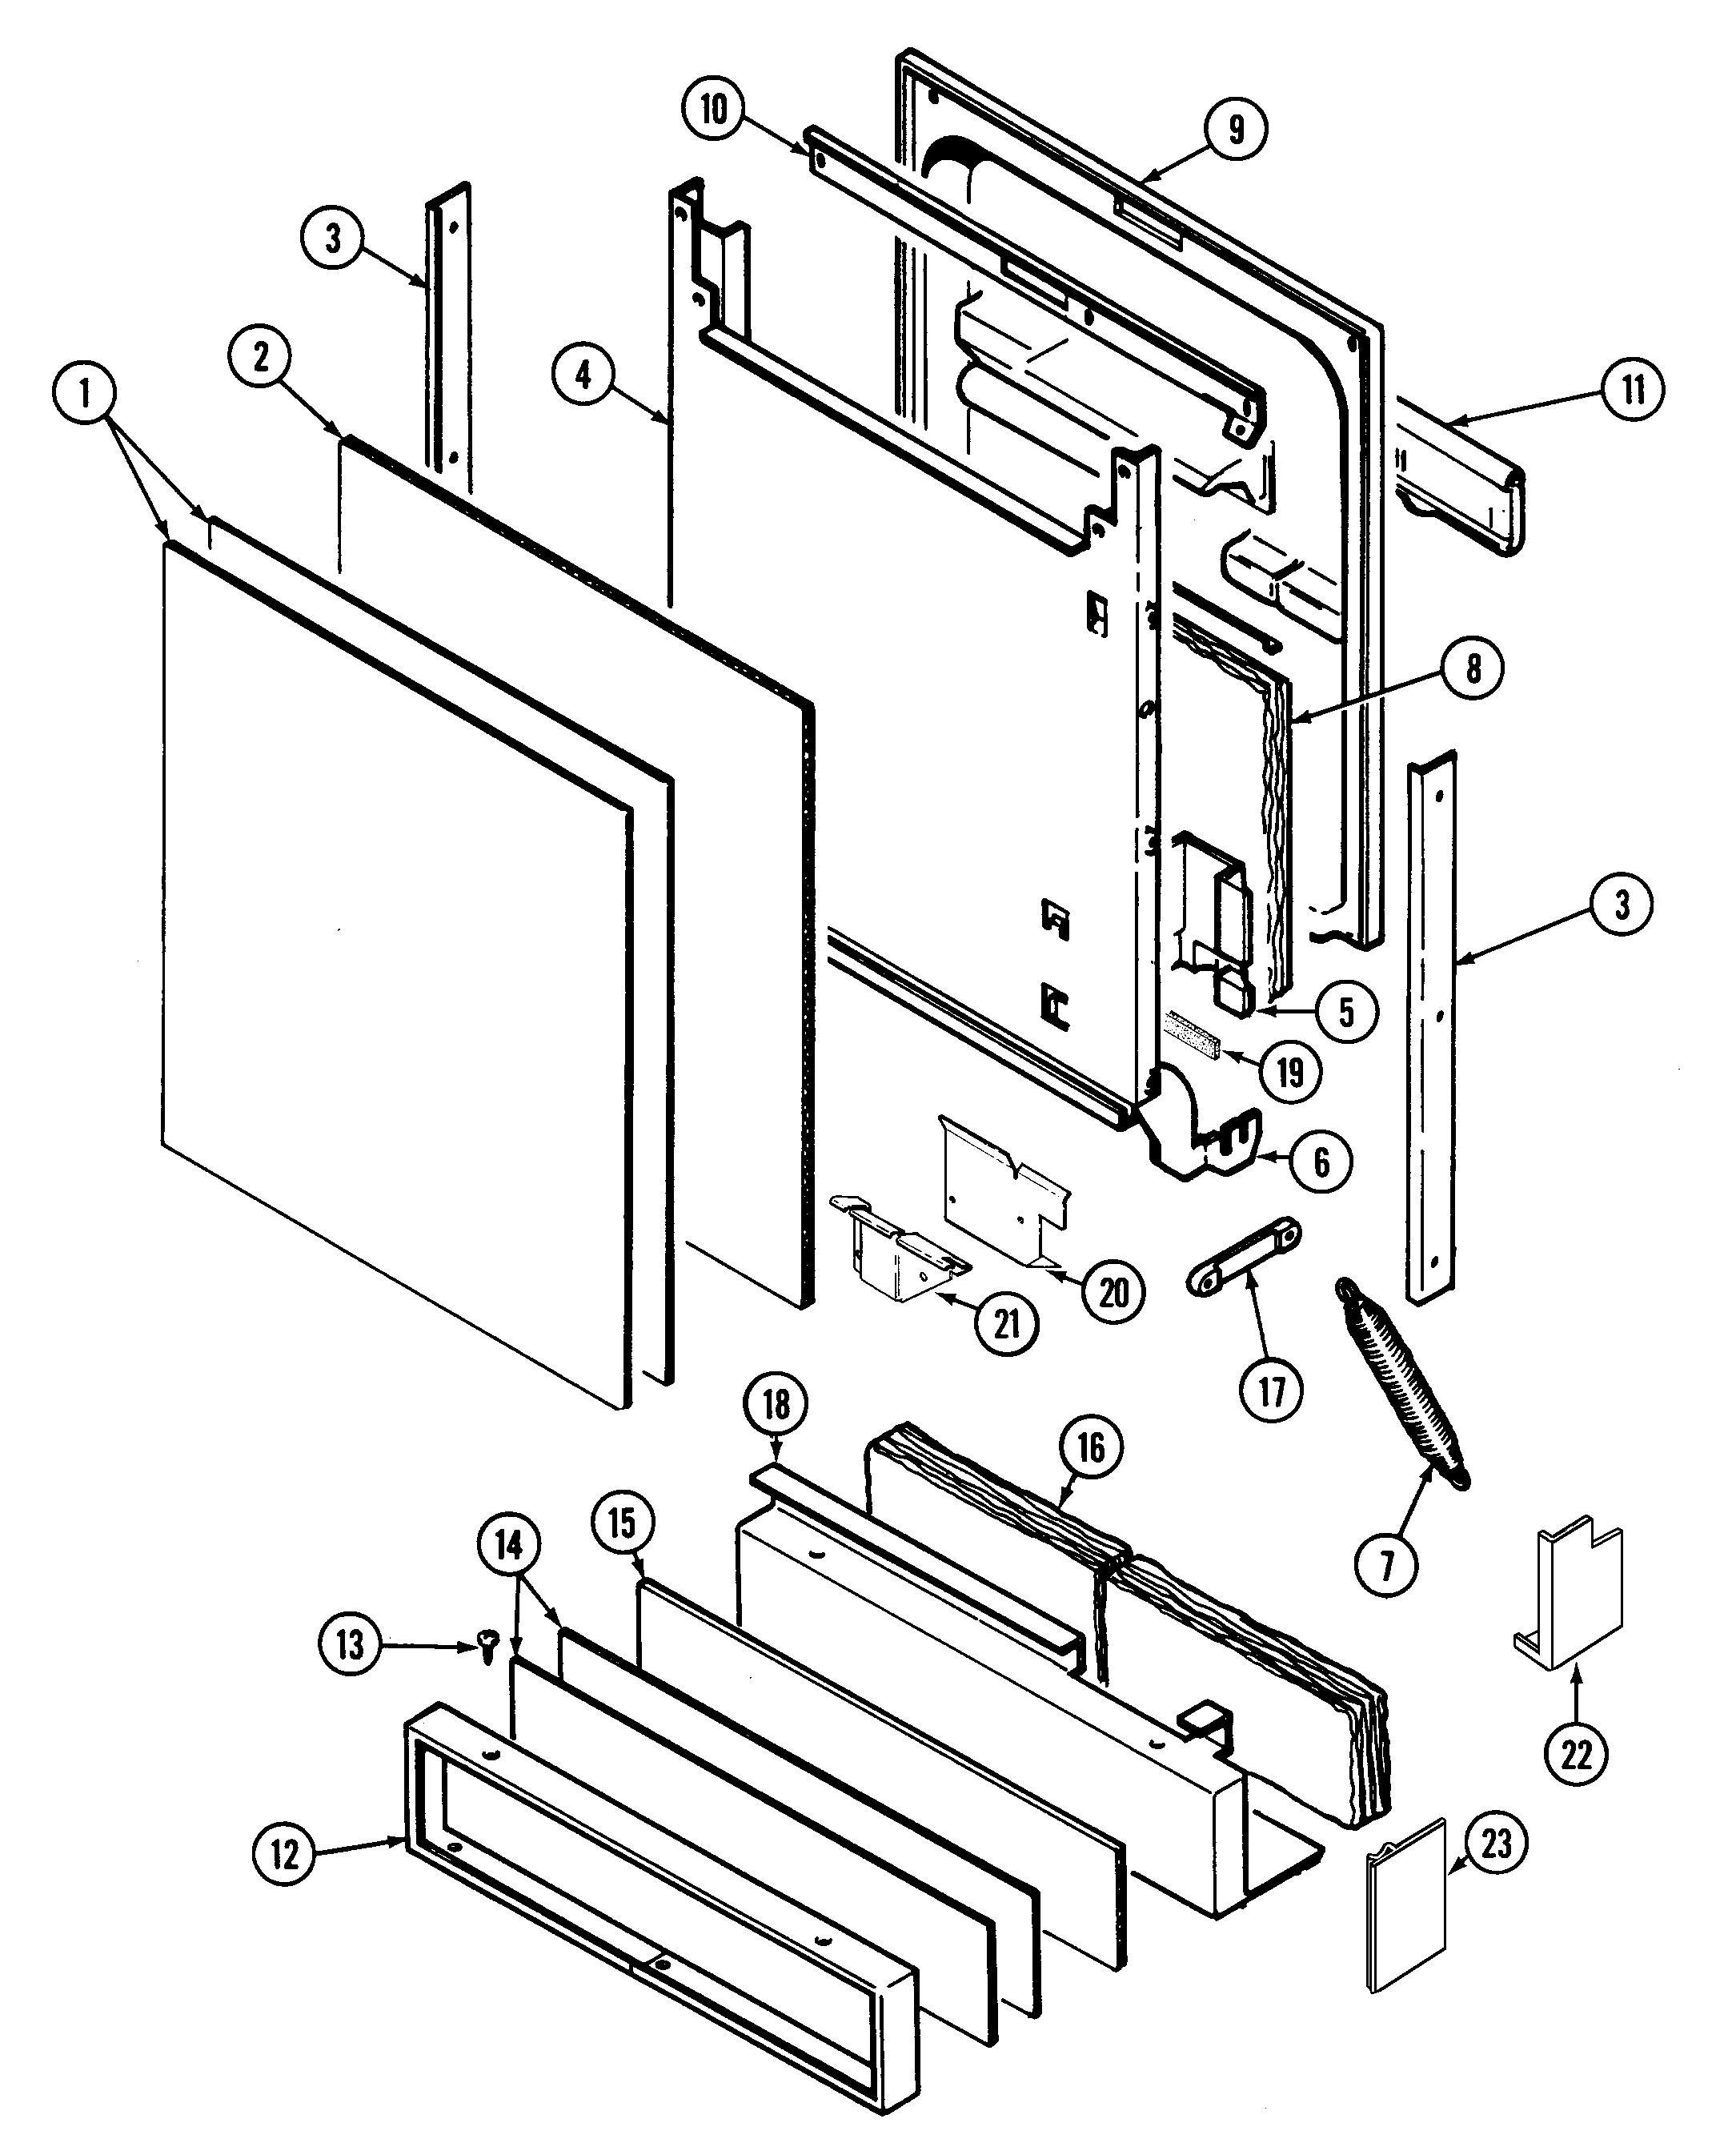 Maytag Dishwasher Parts Sears